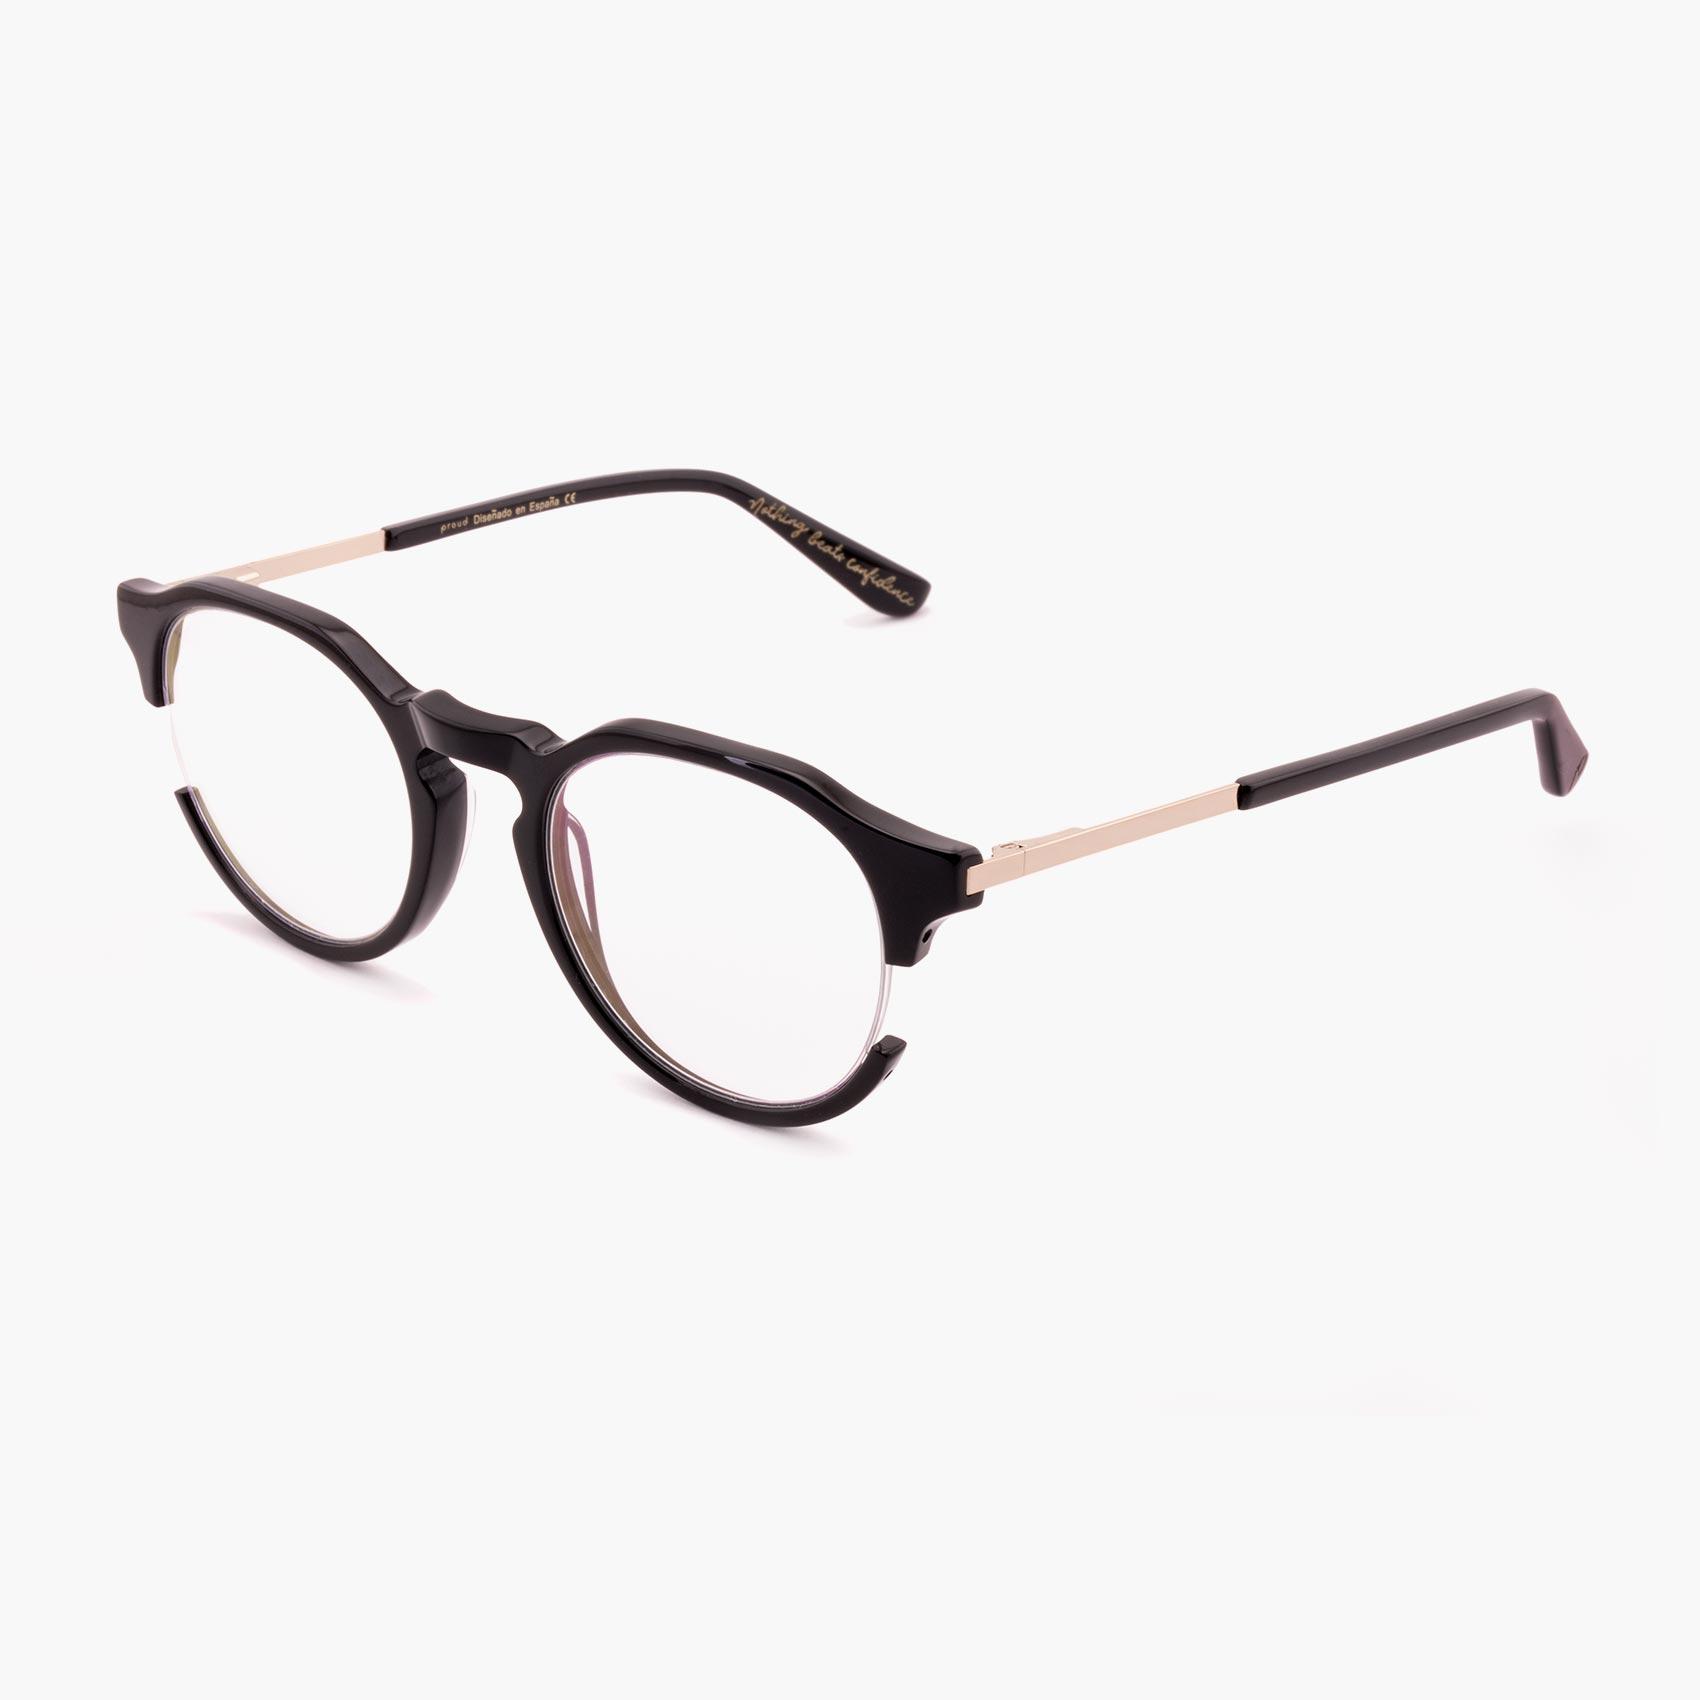 Proud eyewear Jodie C1 P gafas de vista mujer moda